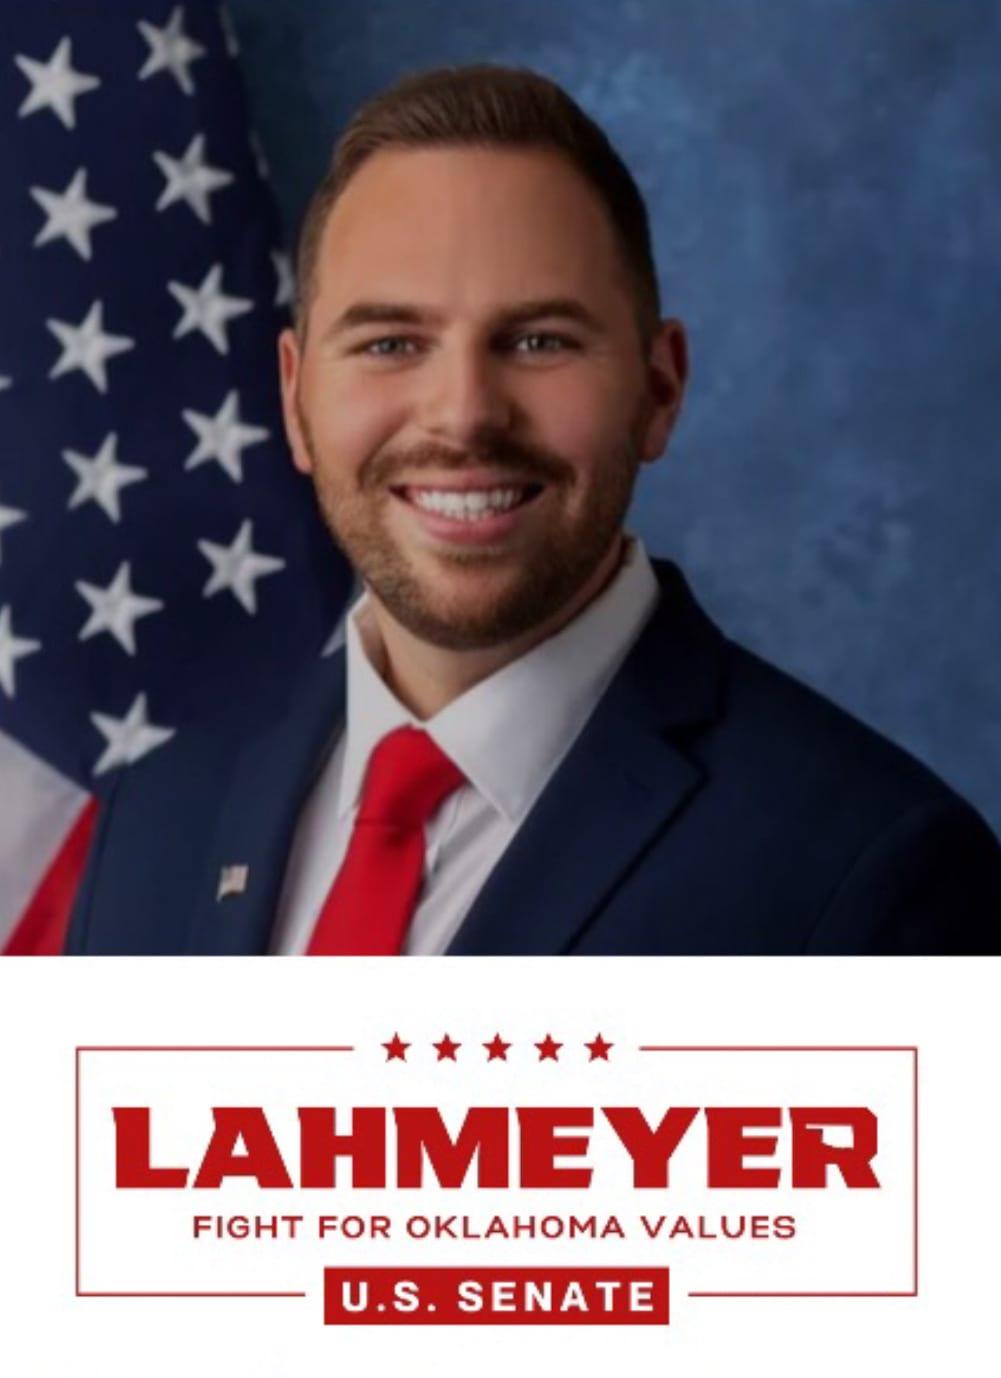 Jackson Lahmeyer Promo Pic